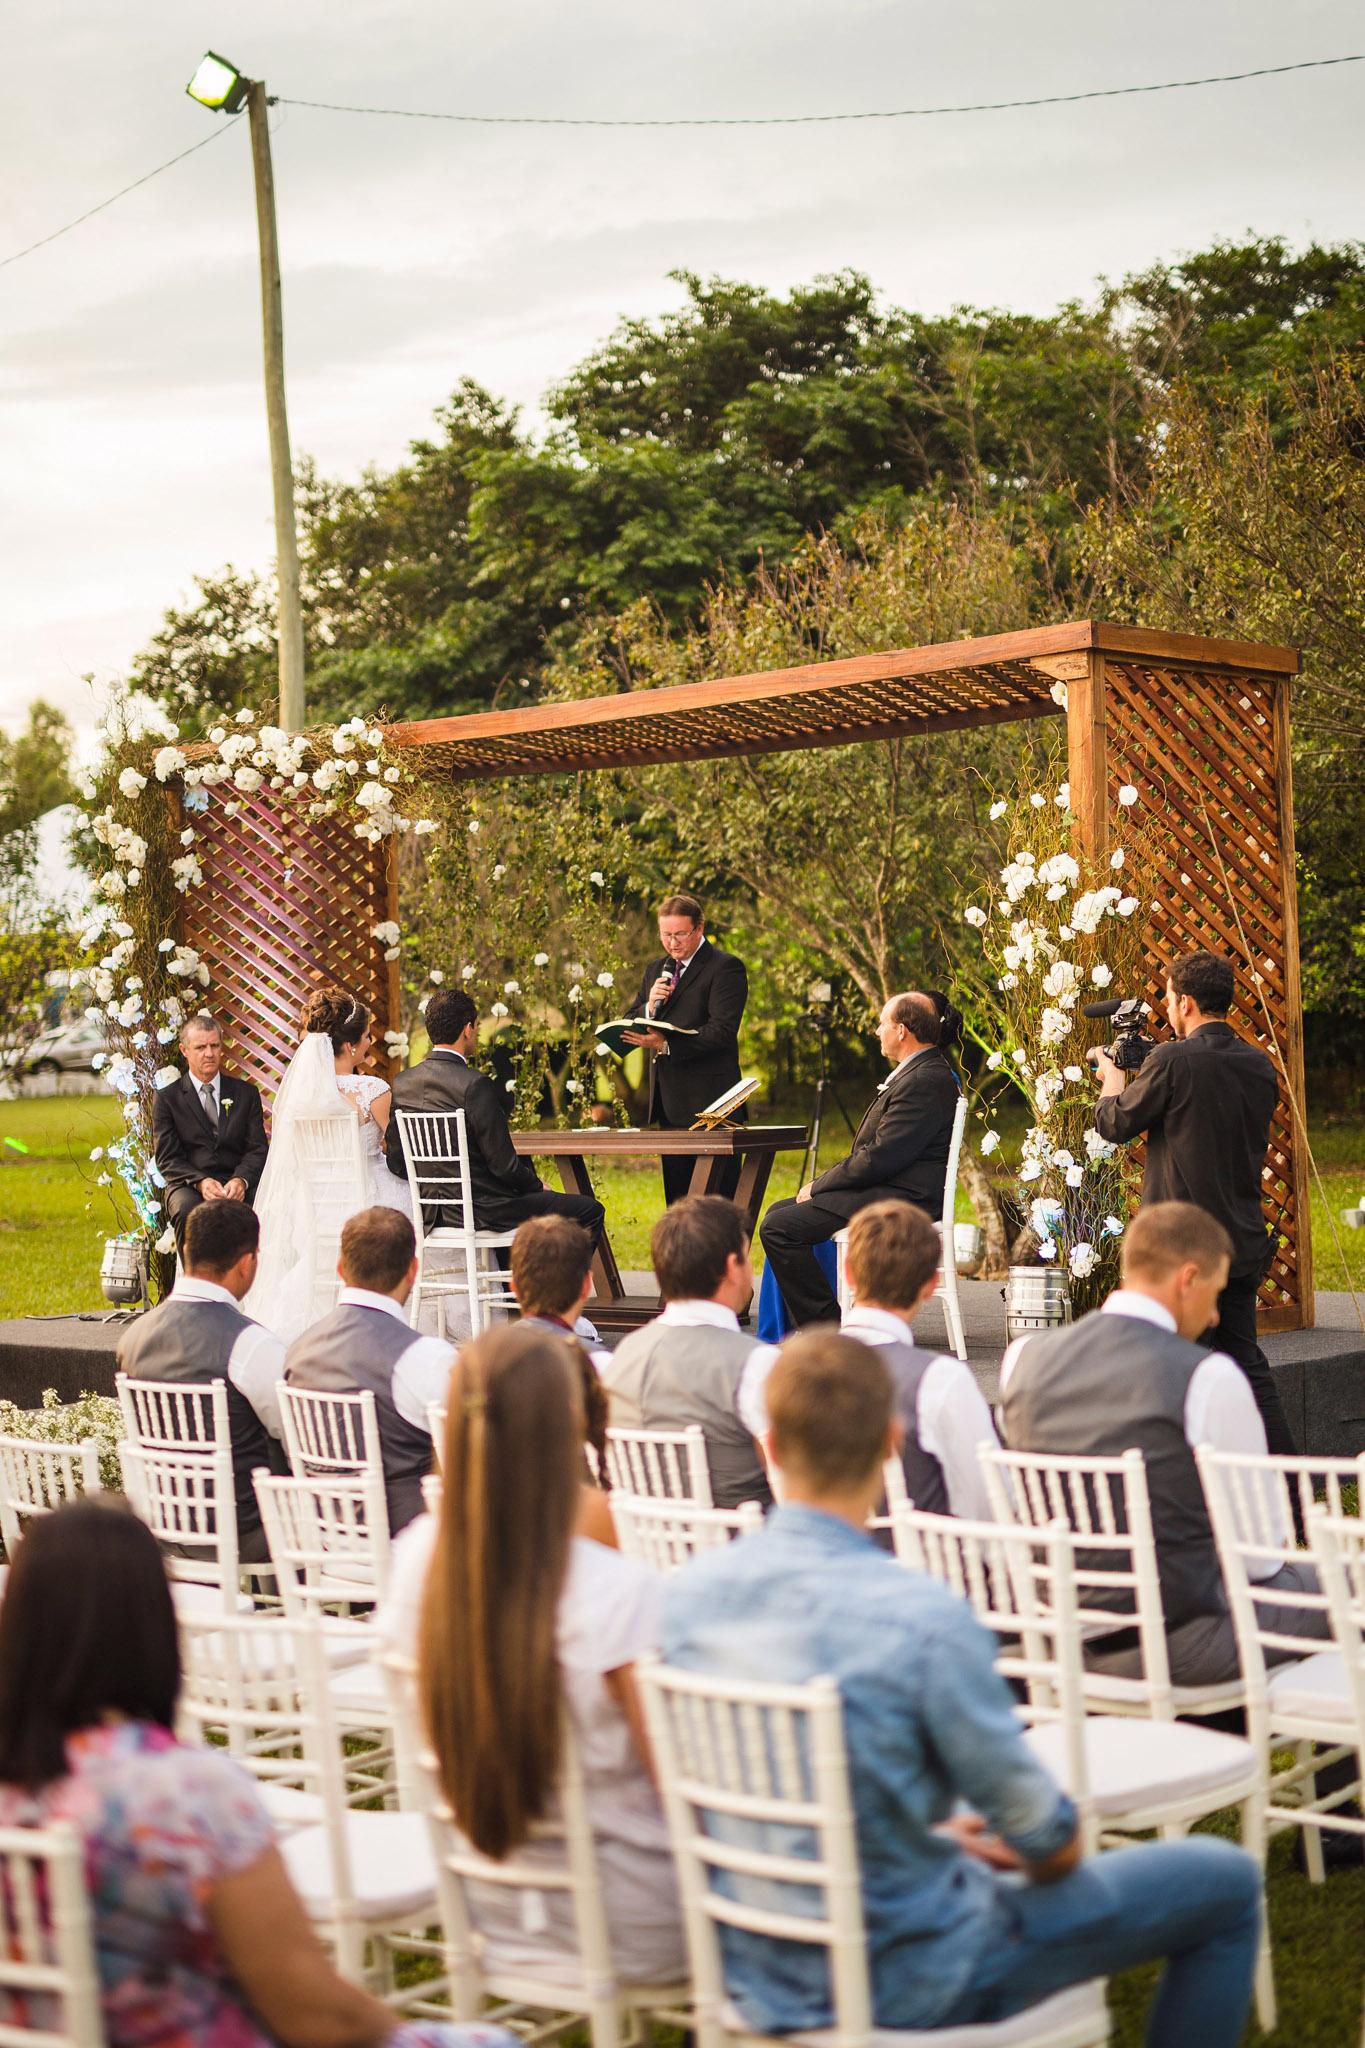 Wedding_Travellers_Destination_Wedding_Photography-79.jpg